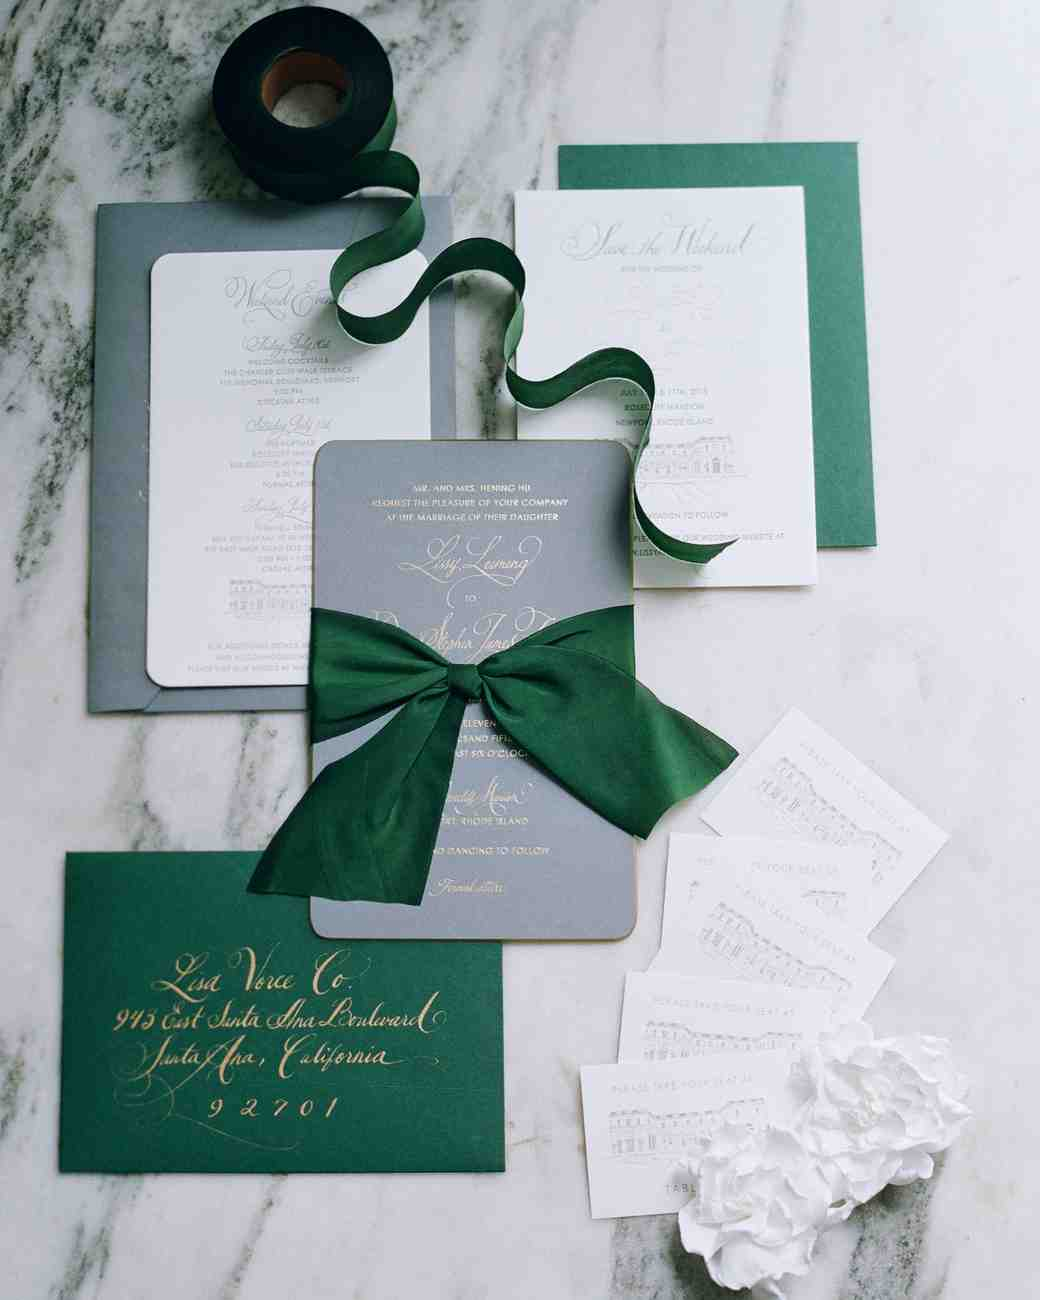 Green and gold metallic invitations